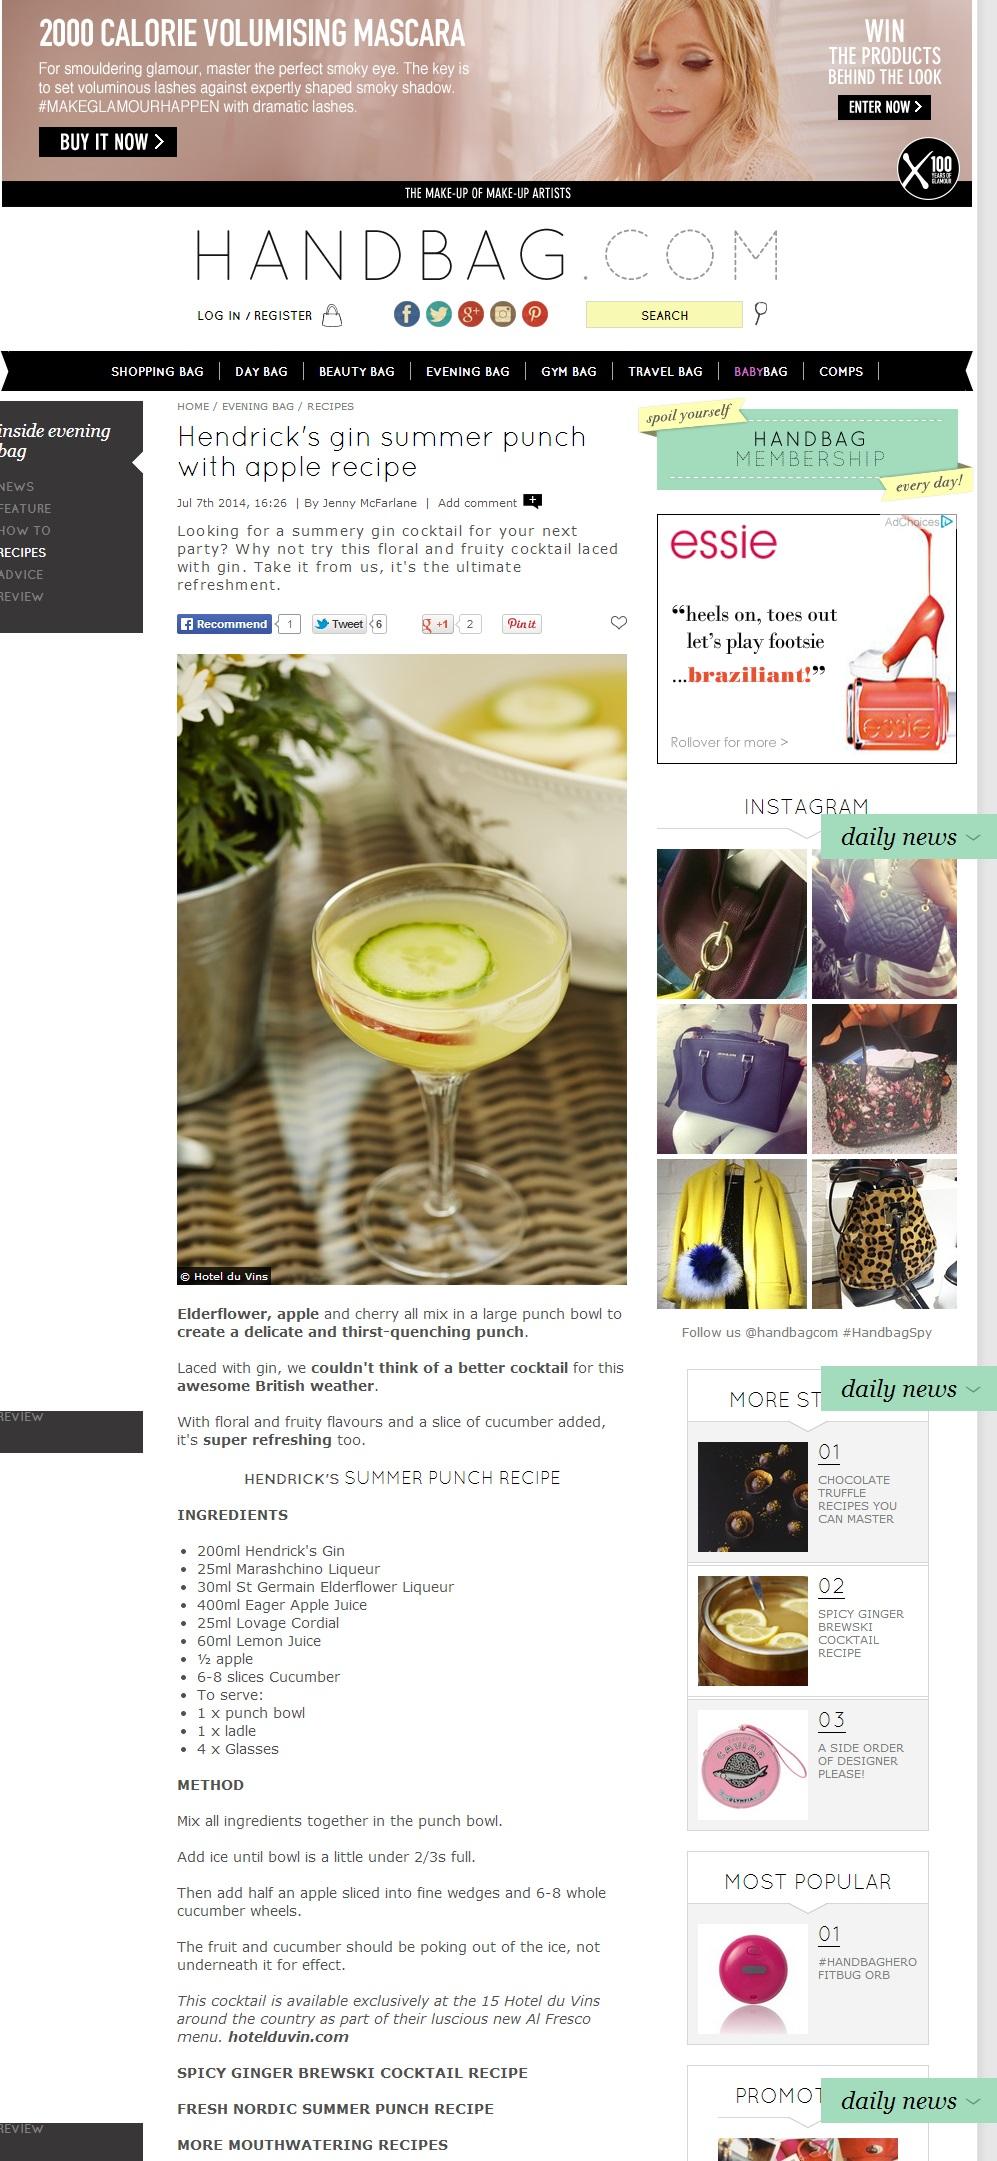 screencapture-www-handbag-com-evening-bag-recipes-a582636-hendricks-gin-summer-punch-with-apple-recipe-html